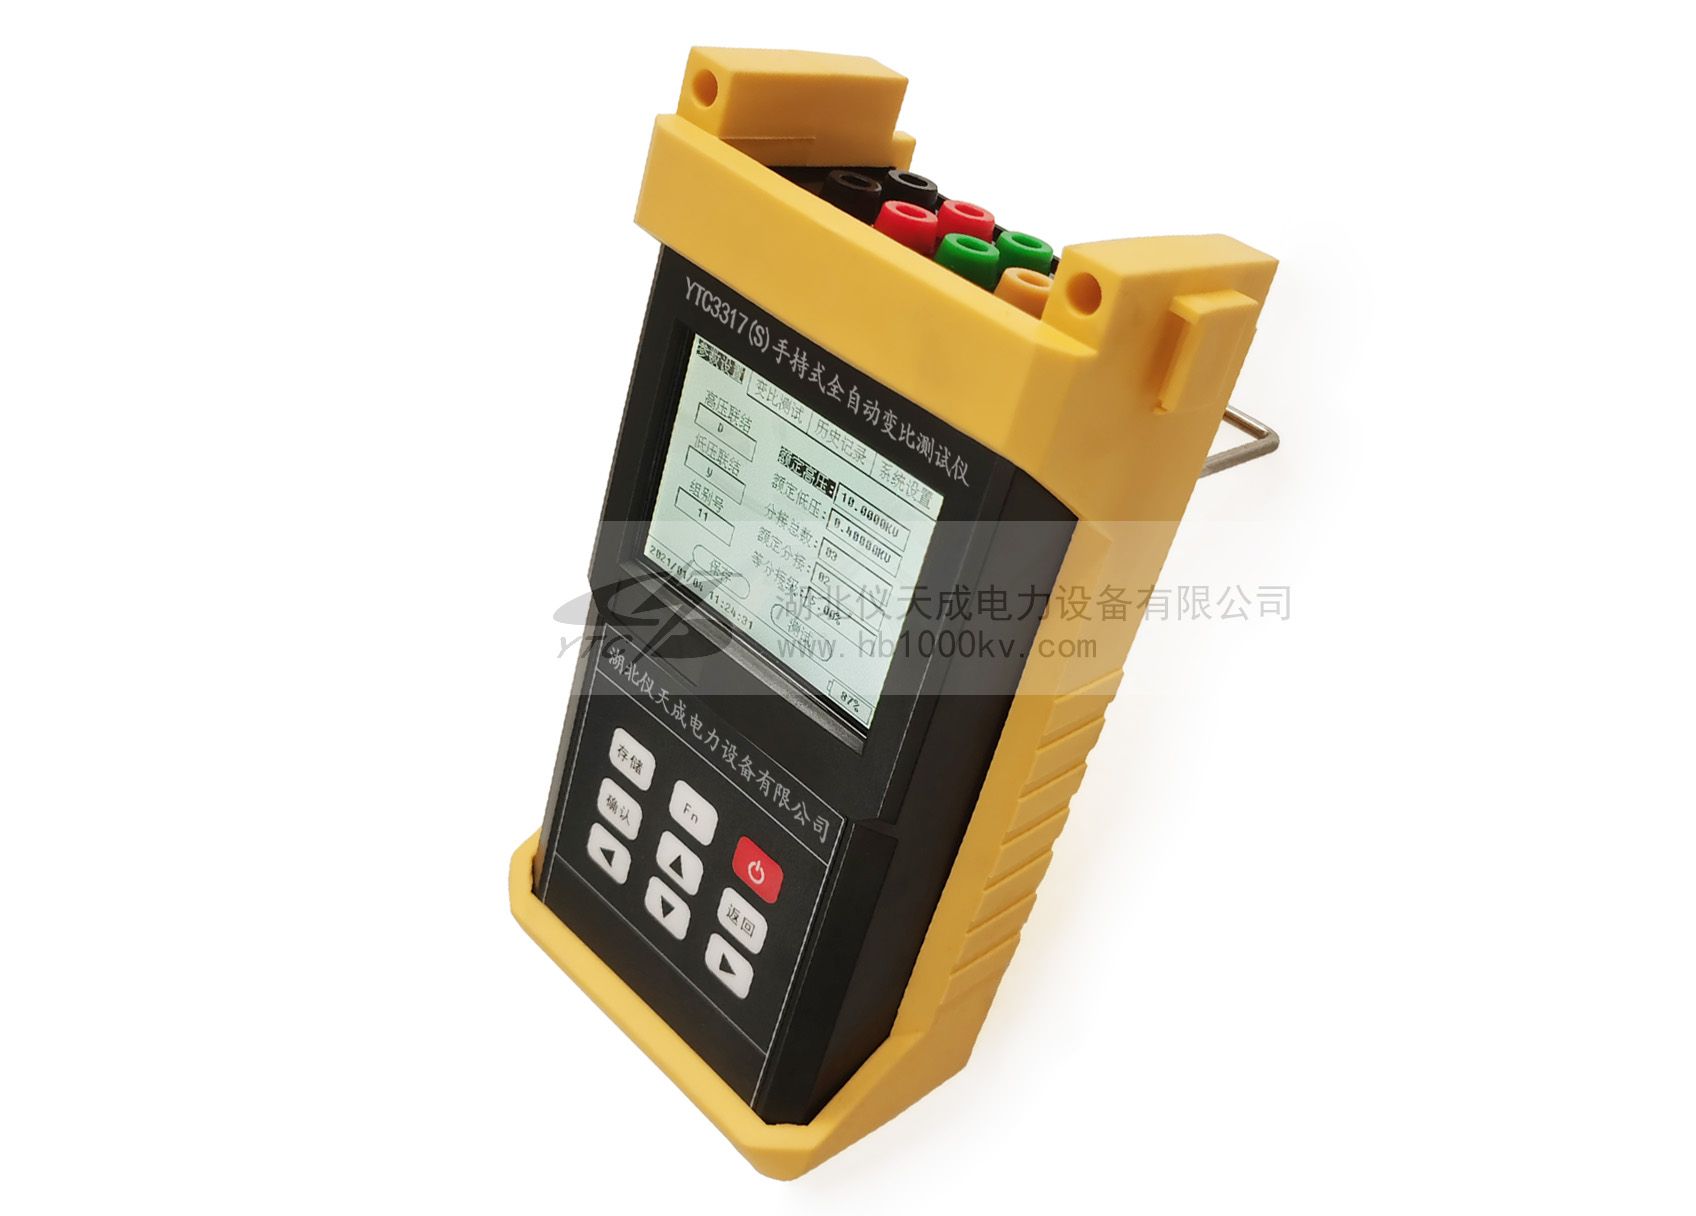 YTC3317(S)手持式全自动变比测试仪主机